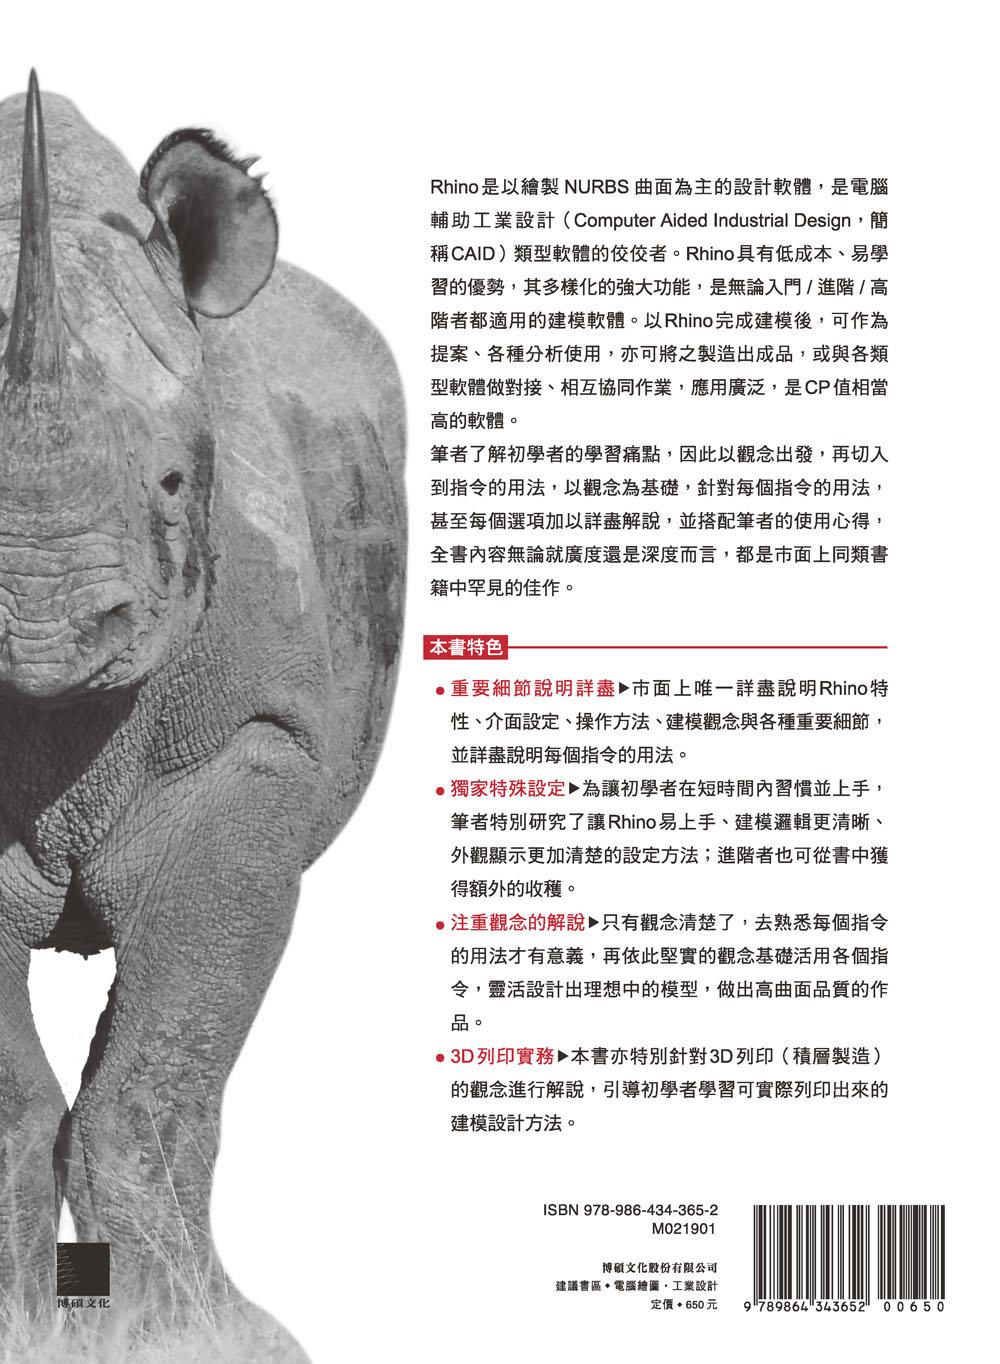 Rhinoceros 6 全攻略:自學設計與 3D建模寶典-preview-23